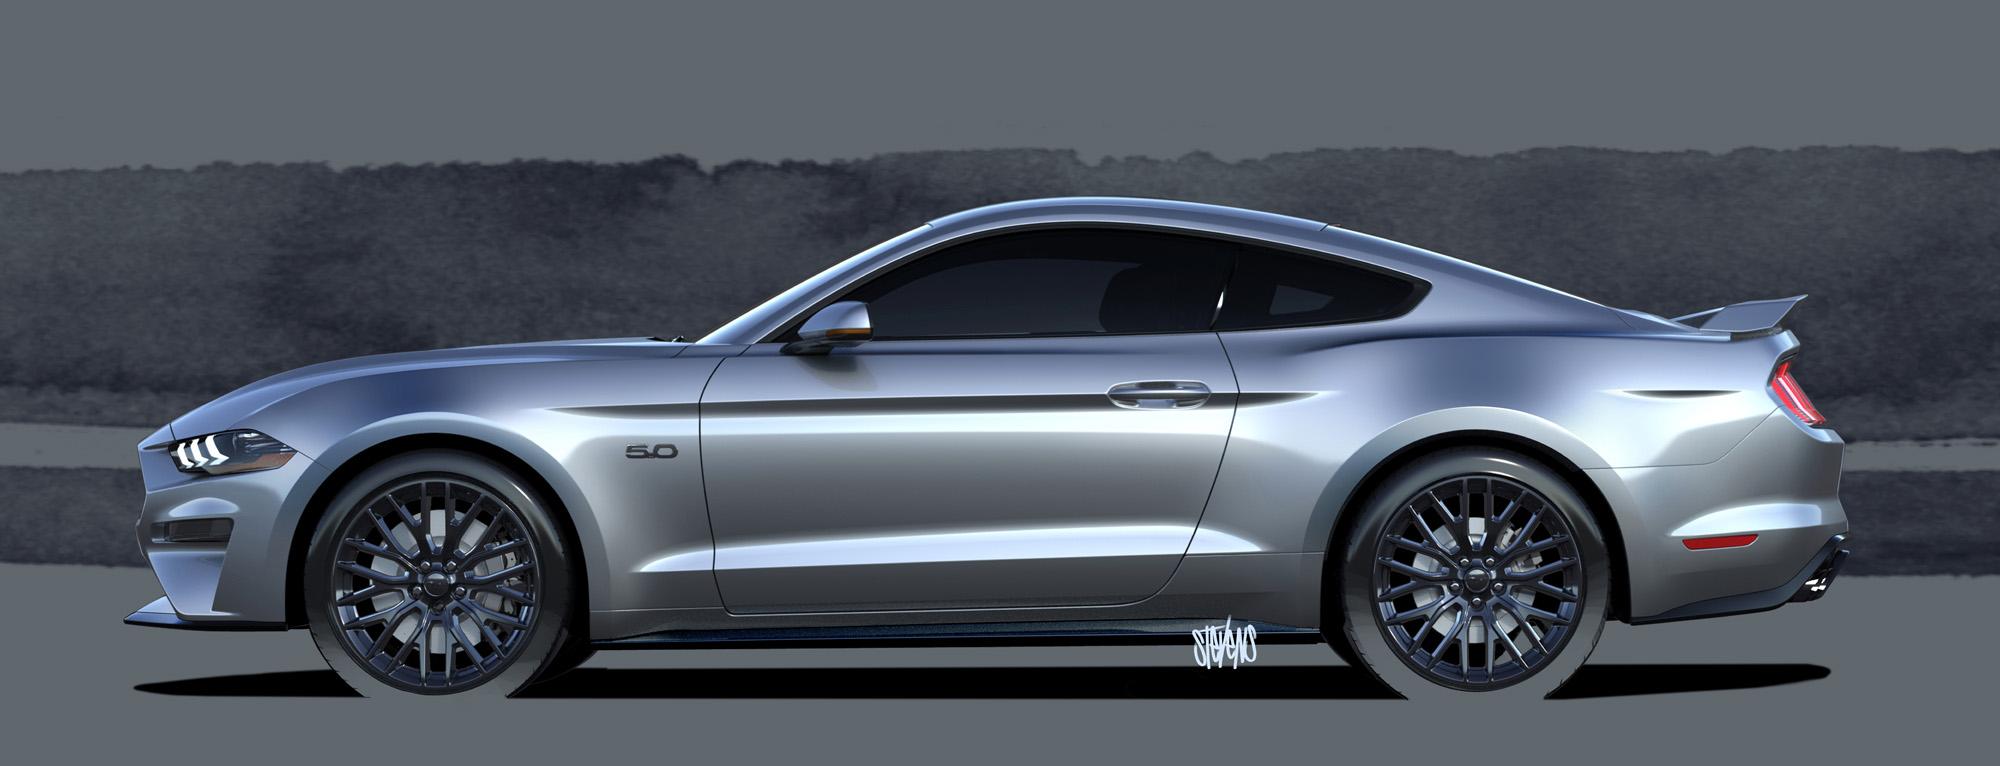 2015 Camaro Fuse Box 2018 Ford Mustang Design Sketch Mustangforums